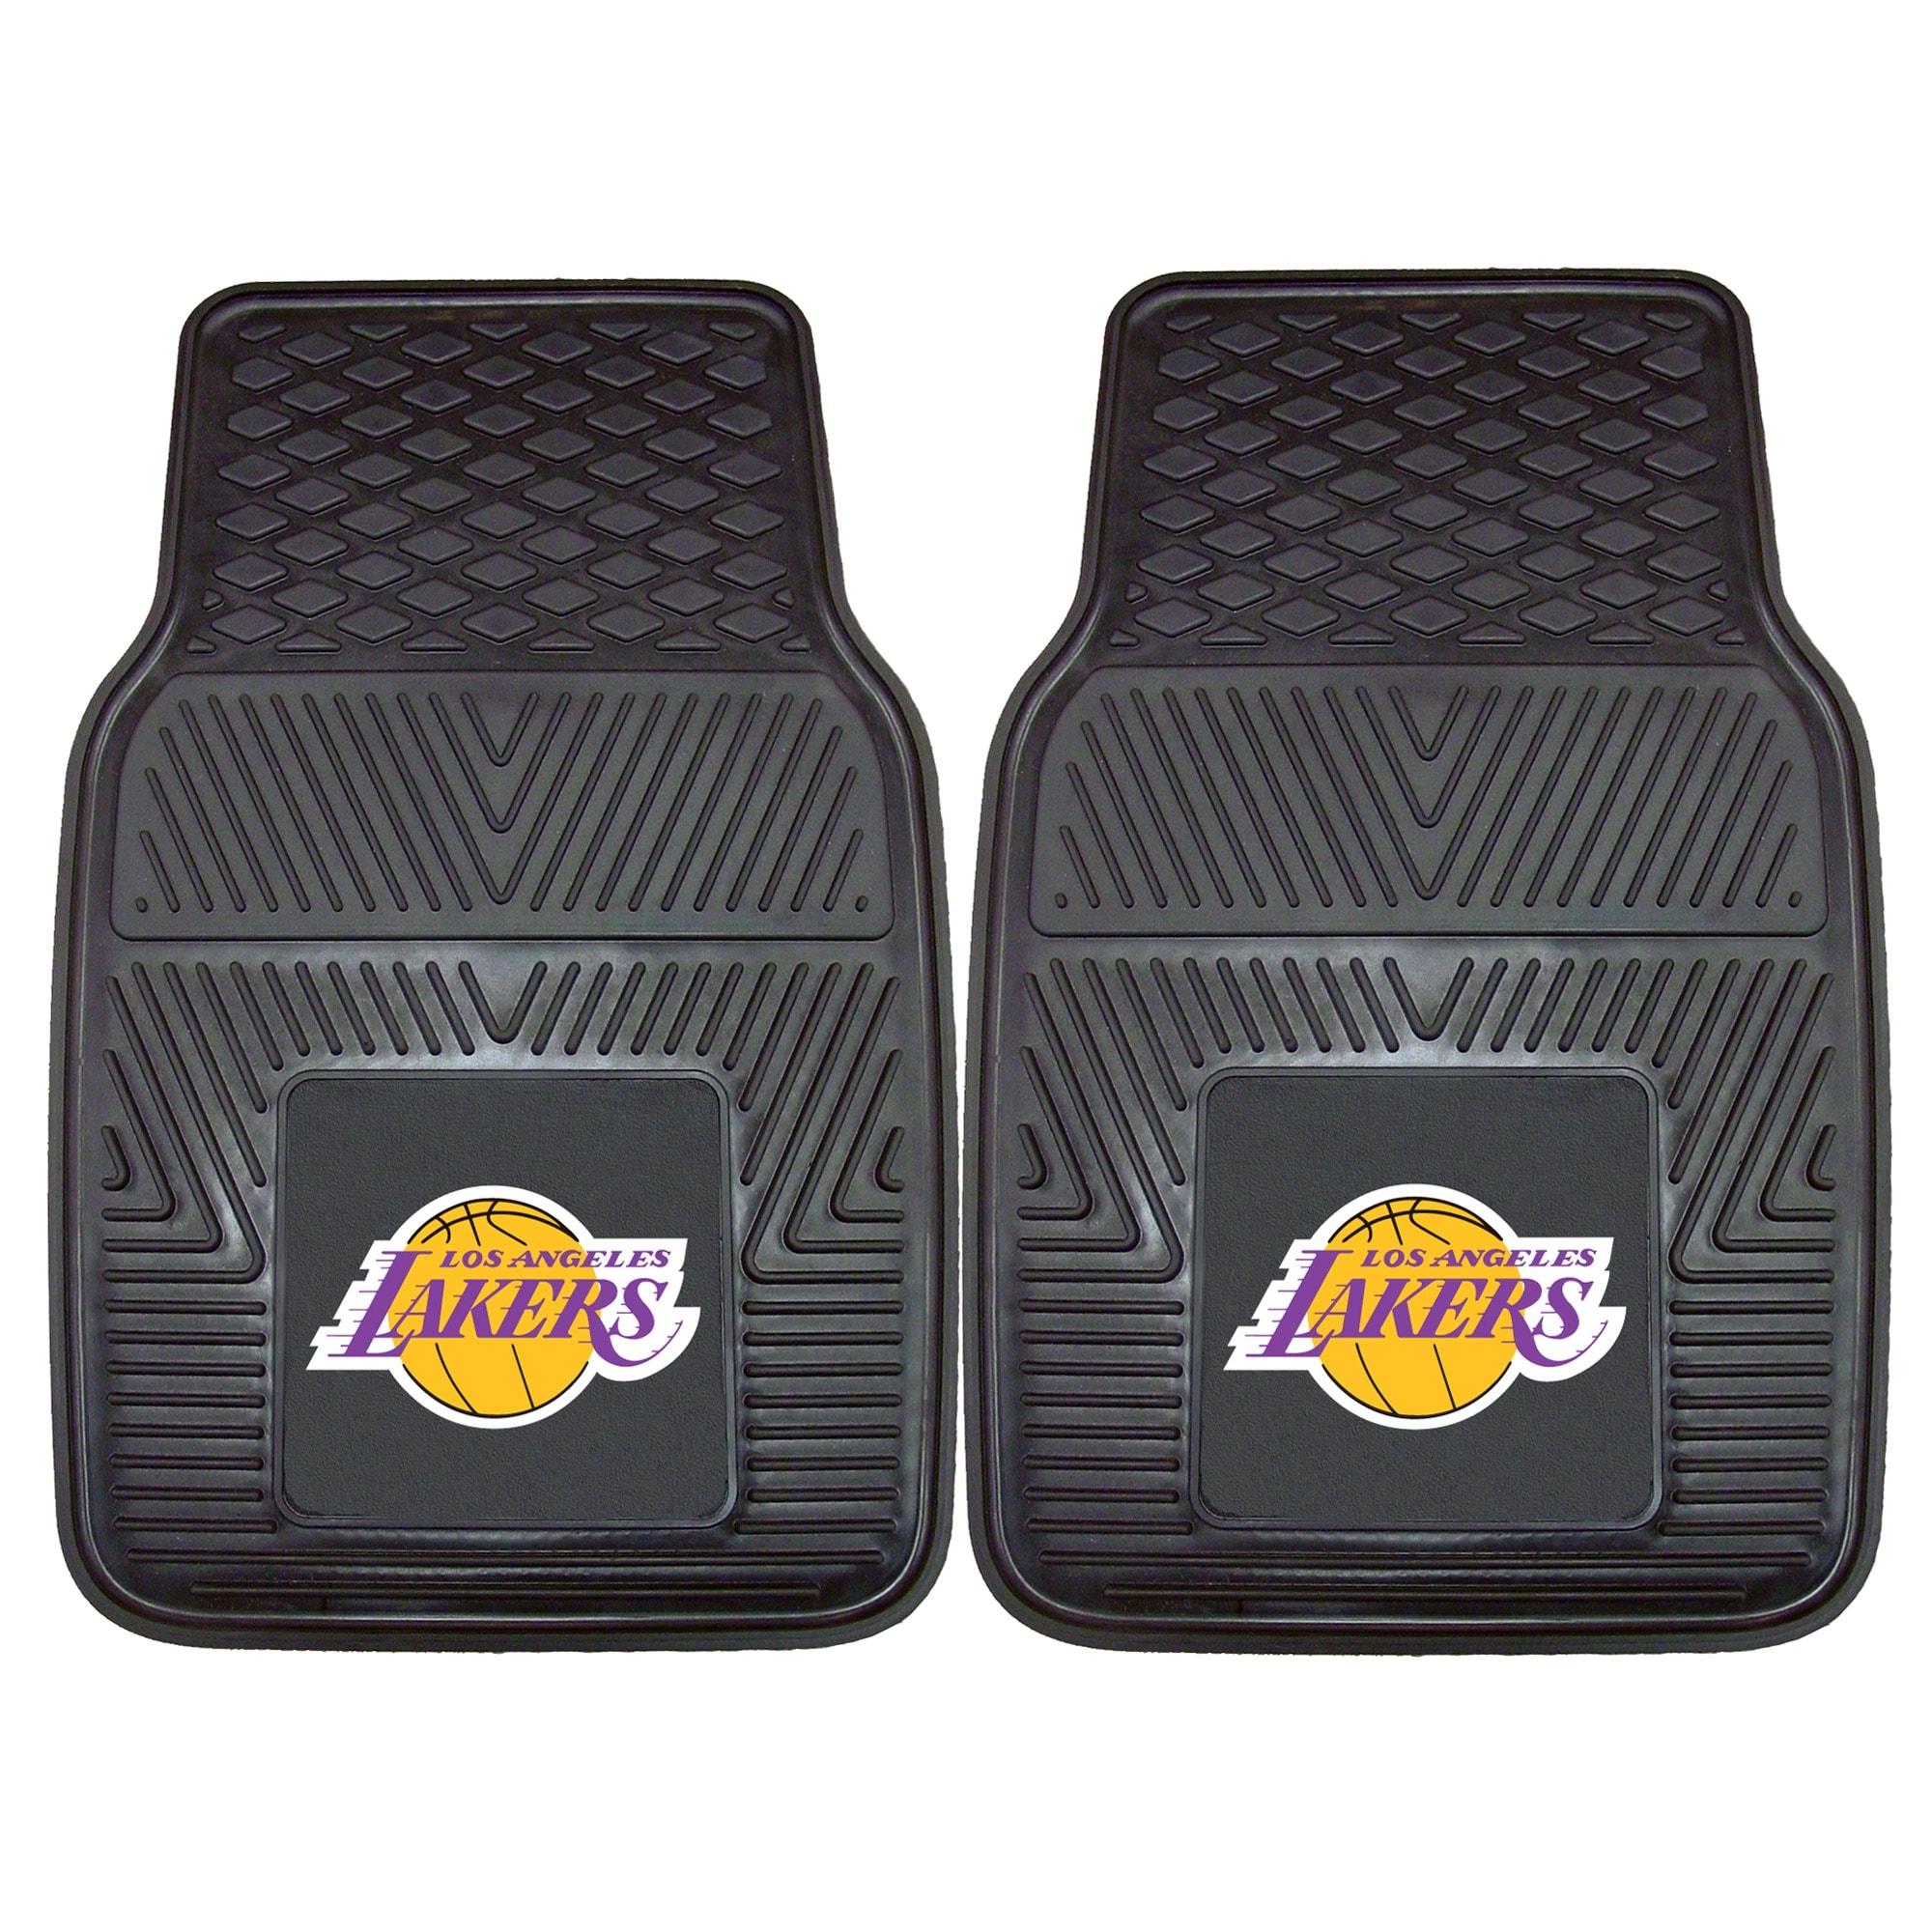 "Los Angeles Lakers 27"" x 18"" 2-Pack Vinyl Car Mat Set"